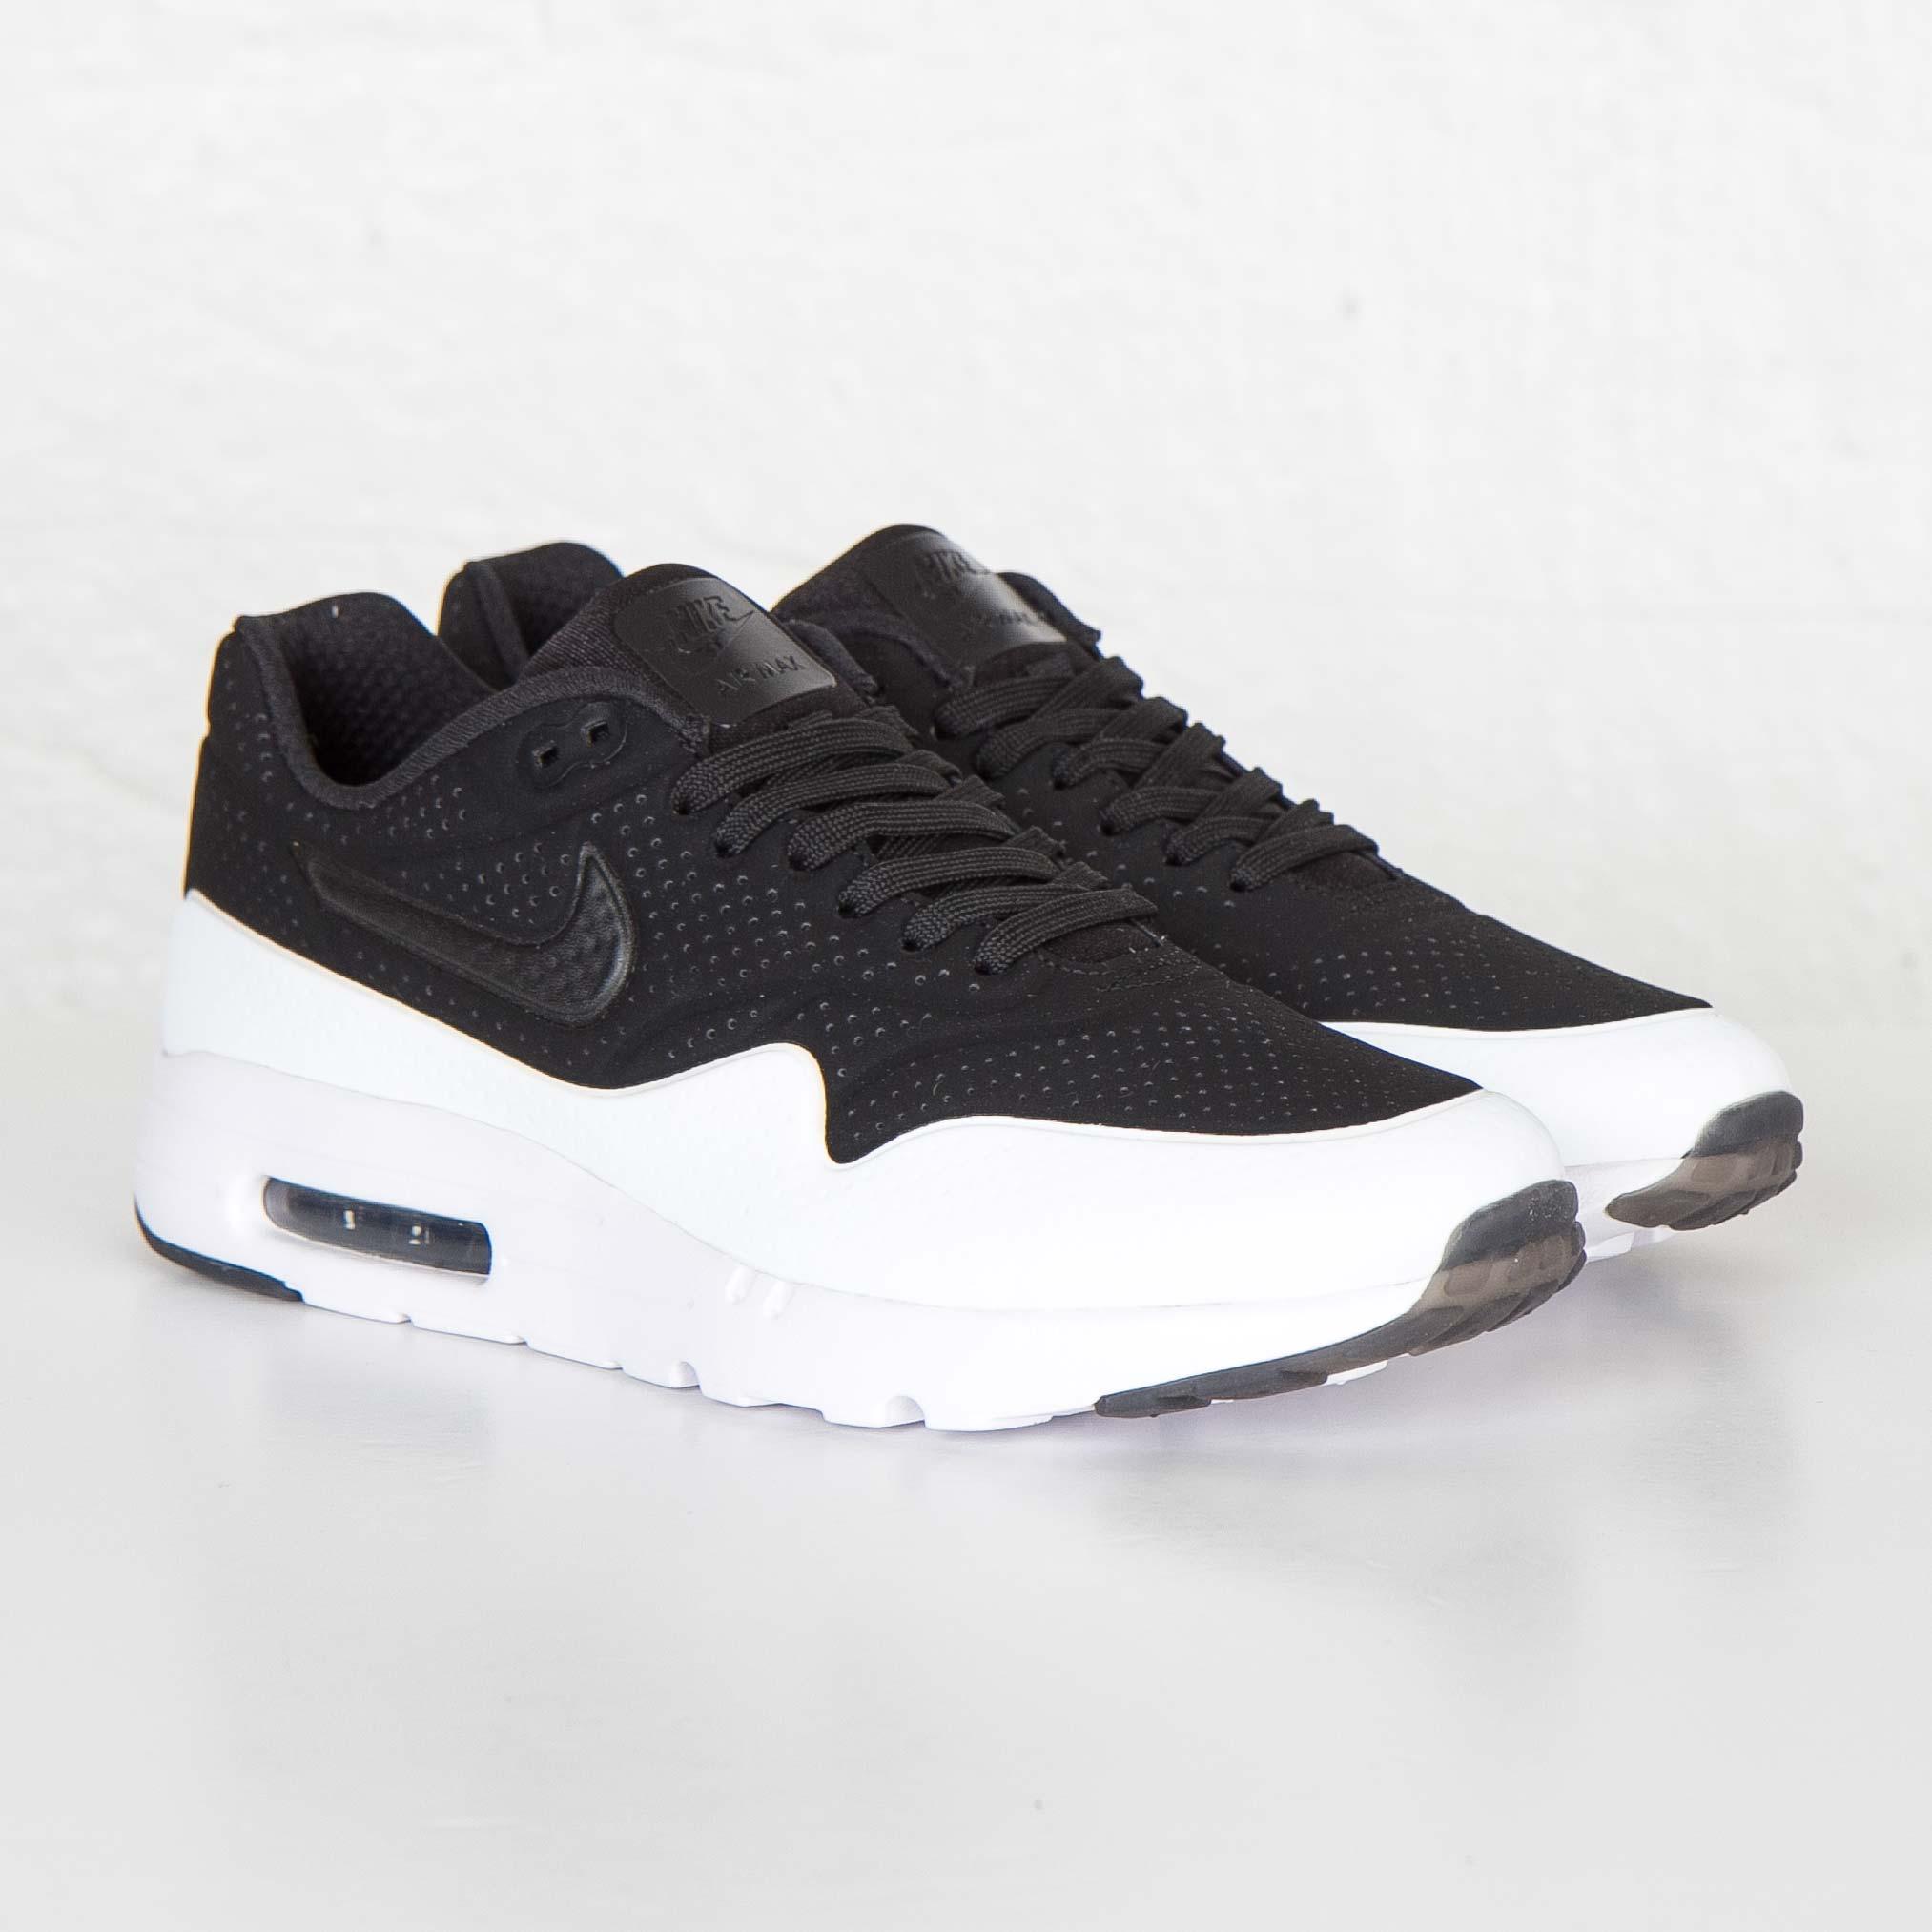 Nike Air Max 1 Ultra Moire 705297 011 Sneakersnstuff